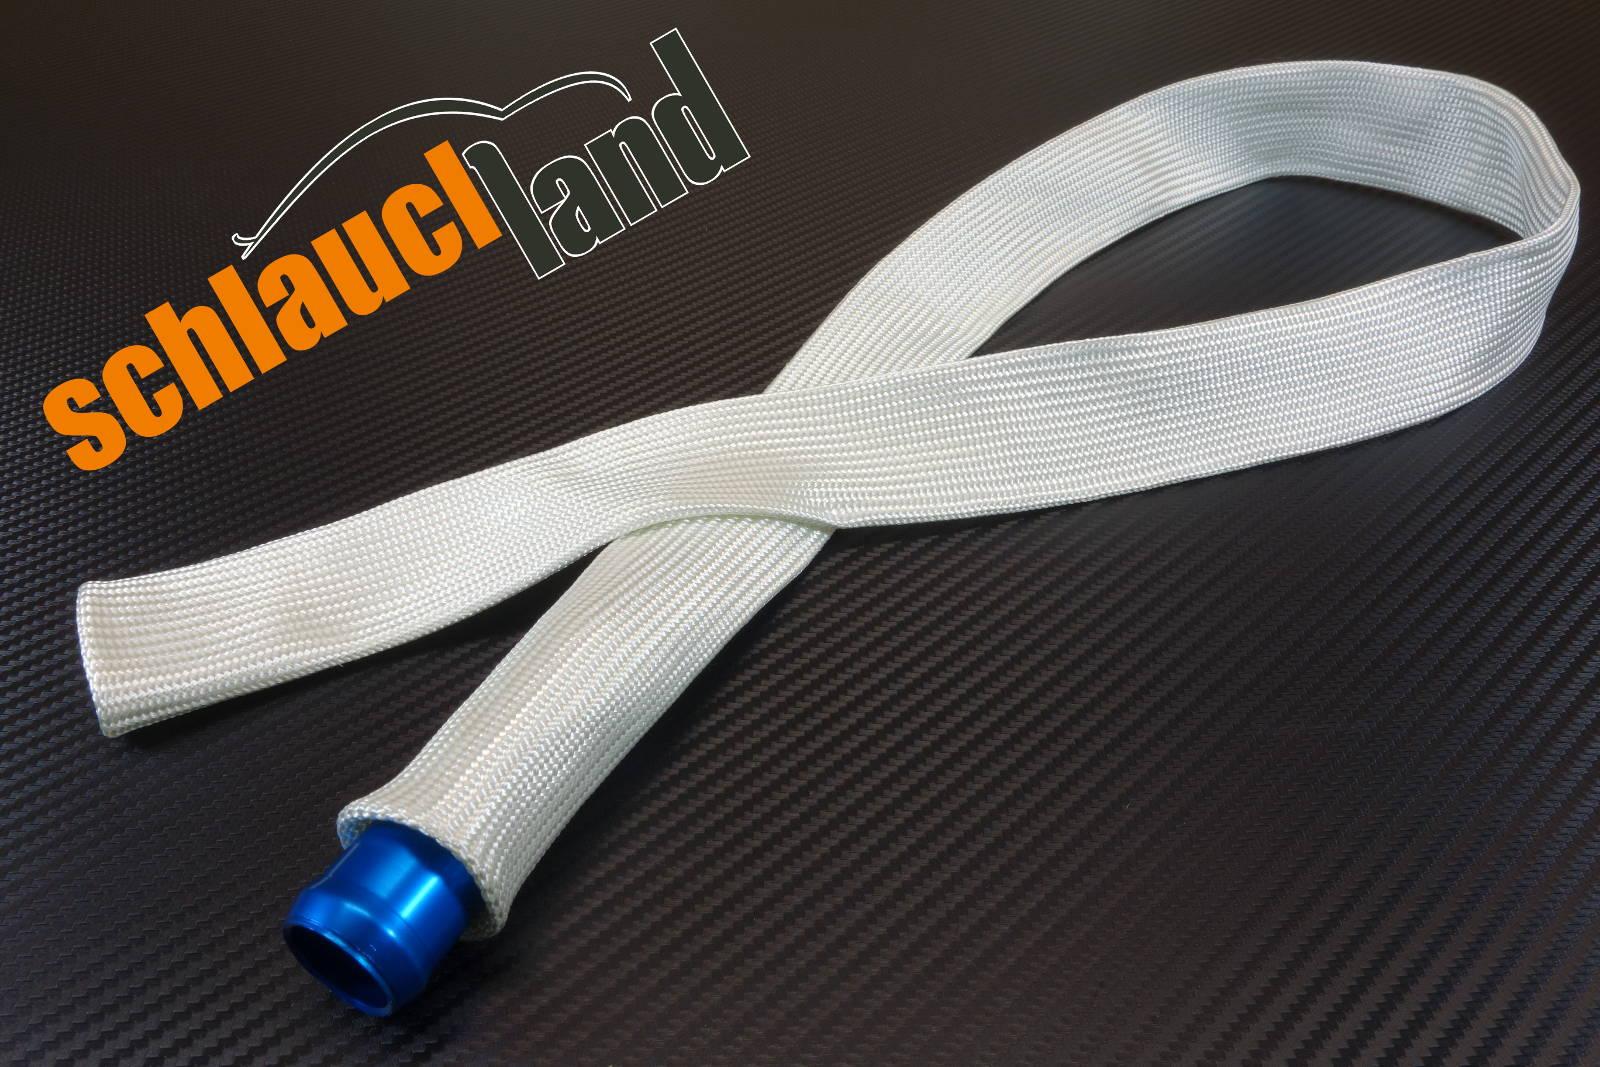 1m FITEX Hitzeschutzschlauch Größen 7-50mm *** Kabelschutz ...